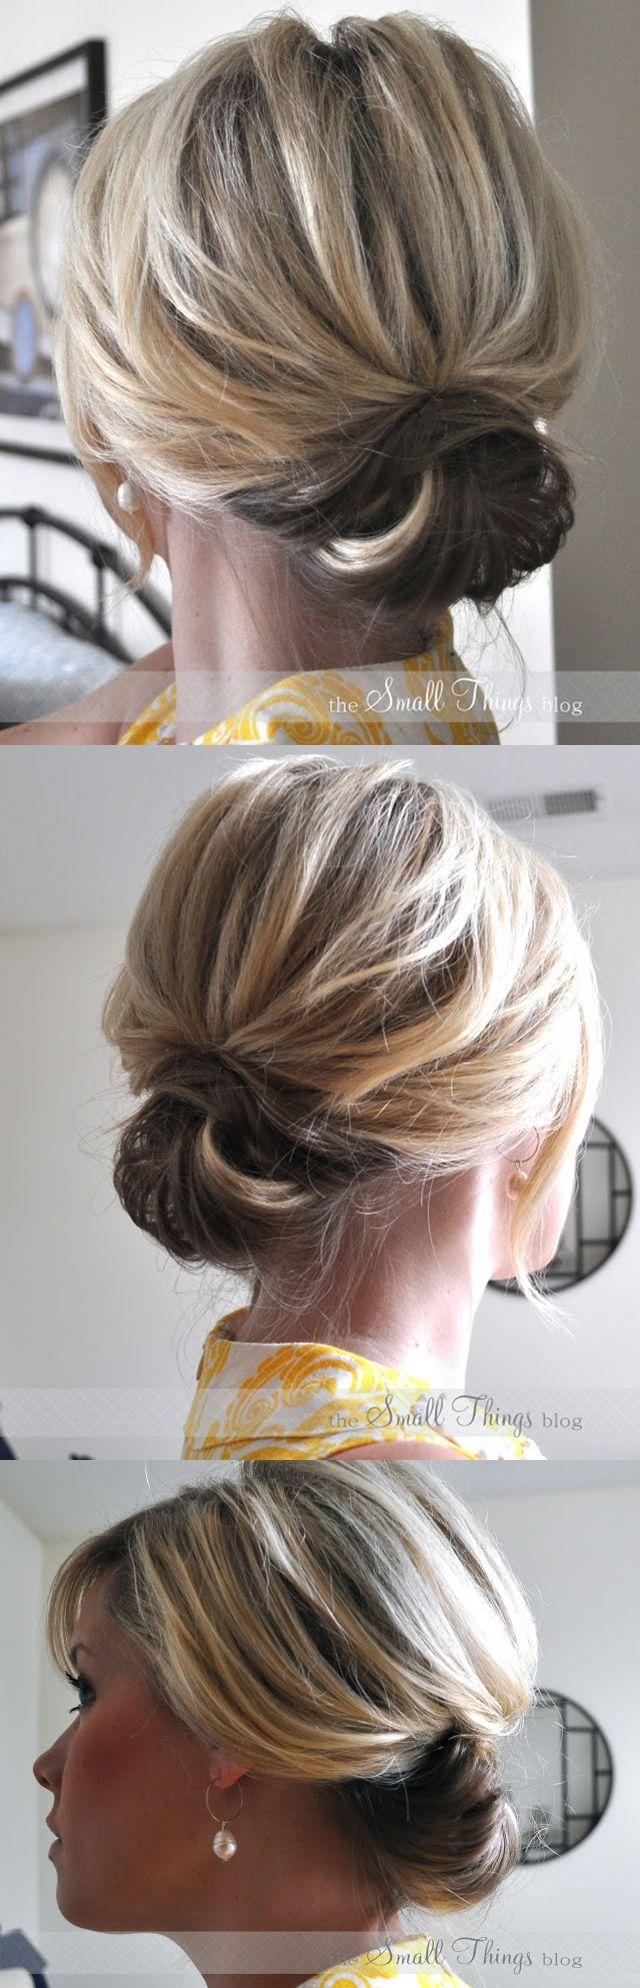 the chic updo | ♥ diy hairstyles ♥ | short wedding hair